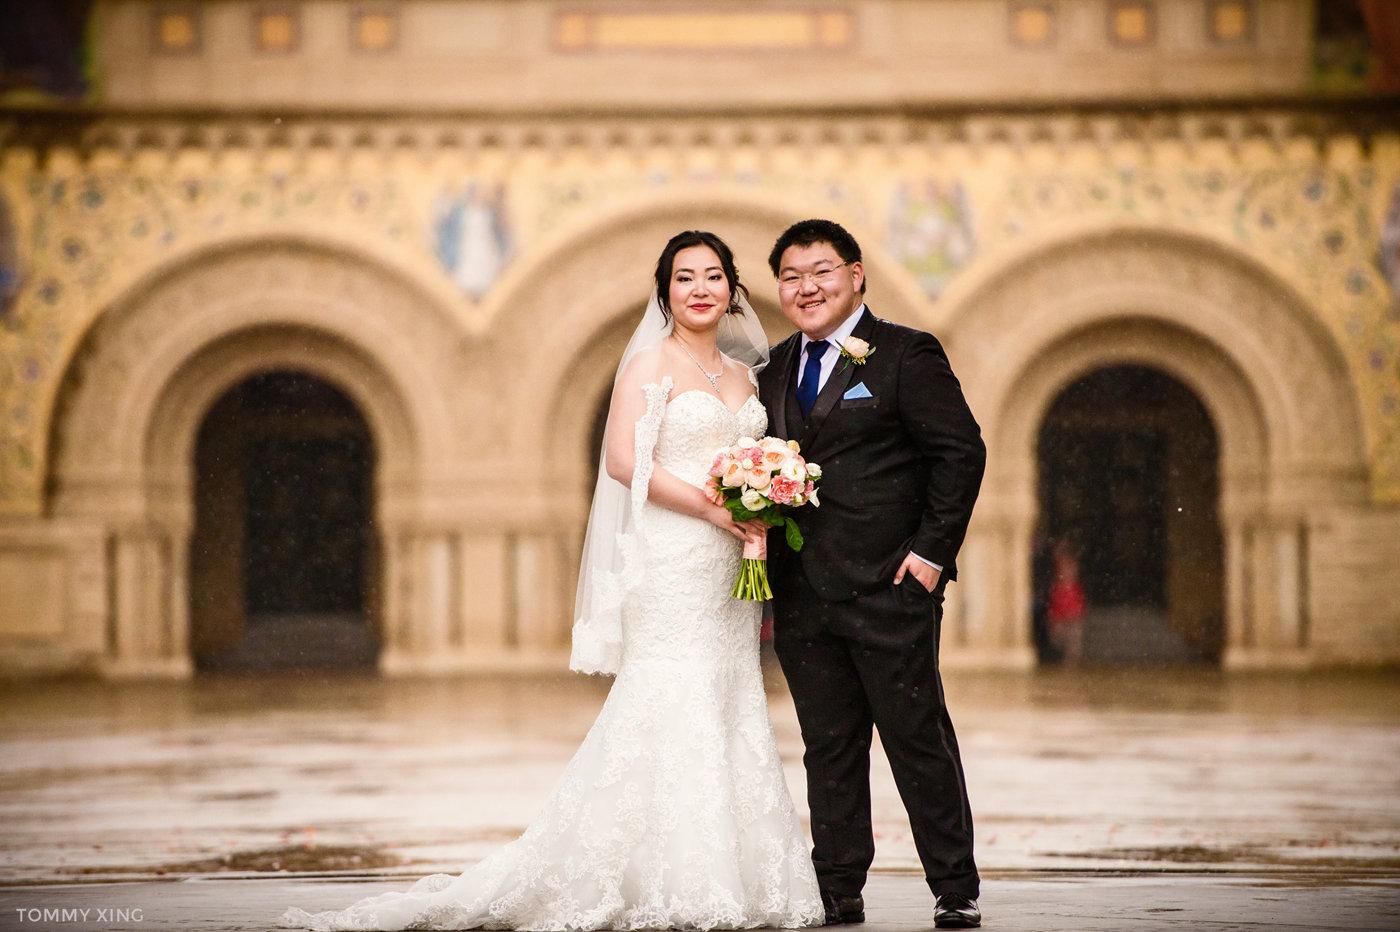 STANFORD MEMORIAL CHURCH WEDDING - Wenjie & Chengcheng - SAN FRANCISCO BAY AREA 斯坦福教堂婚礼跟拍 - 洛杉矶婚礼婚纱照摄影师 Tommy Xing Photography162.jpg